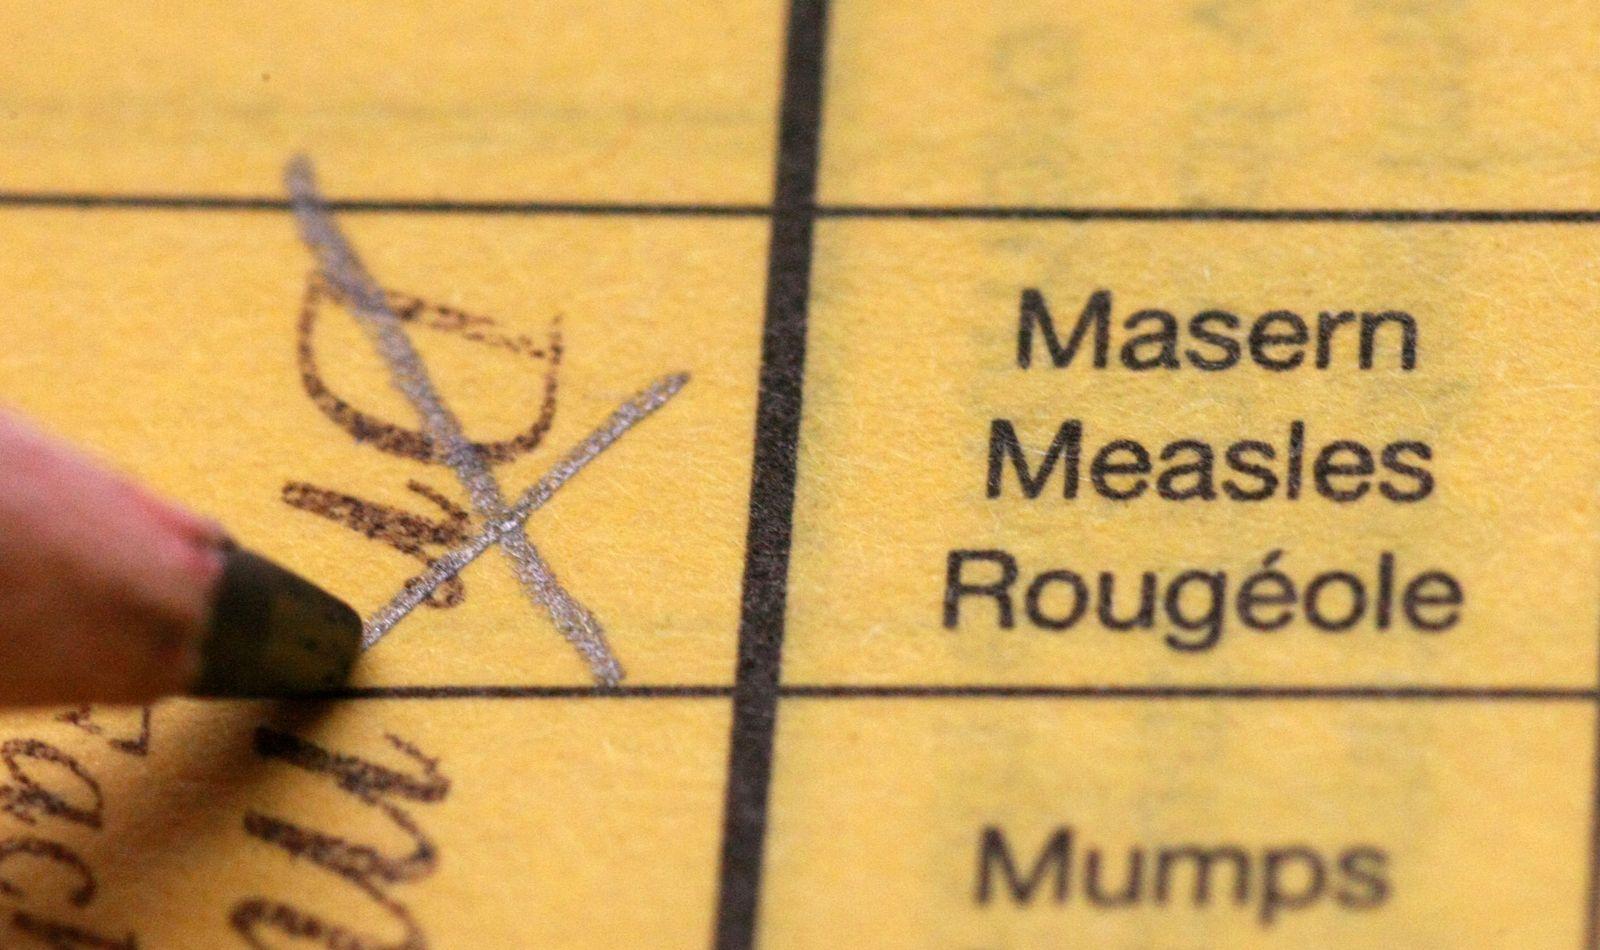 Impfung / Masern